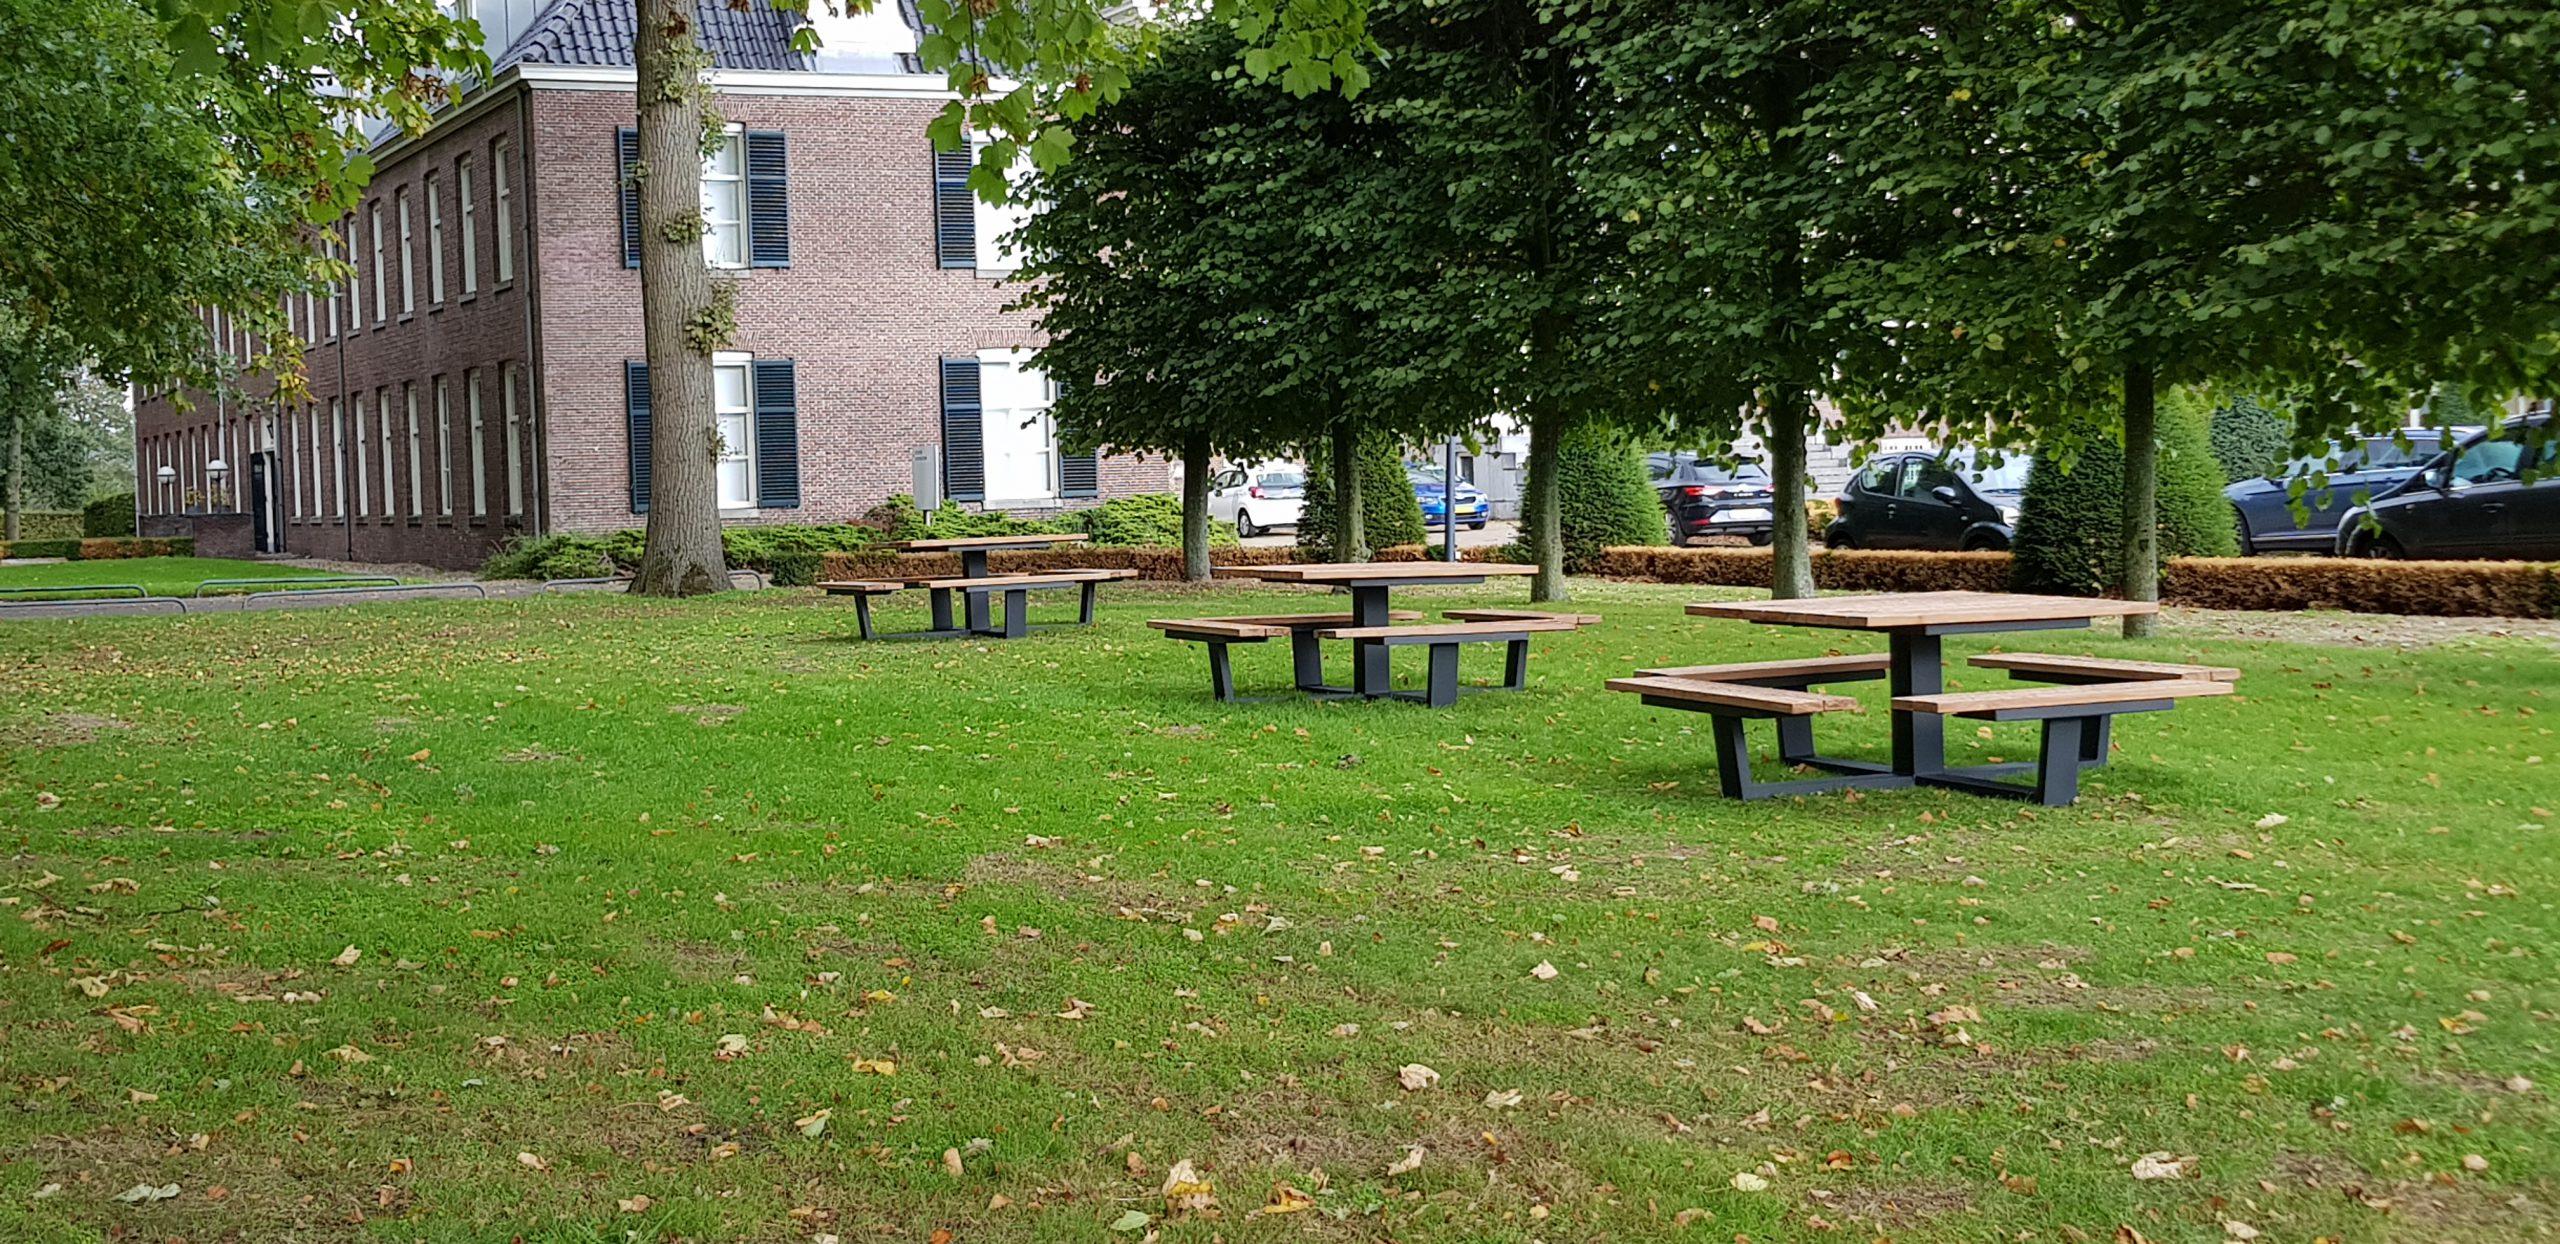 vierkante picknicktafels